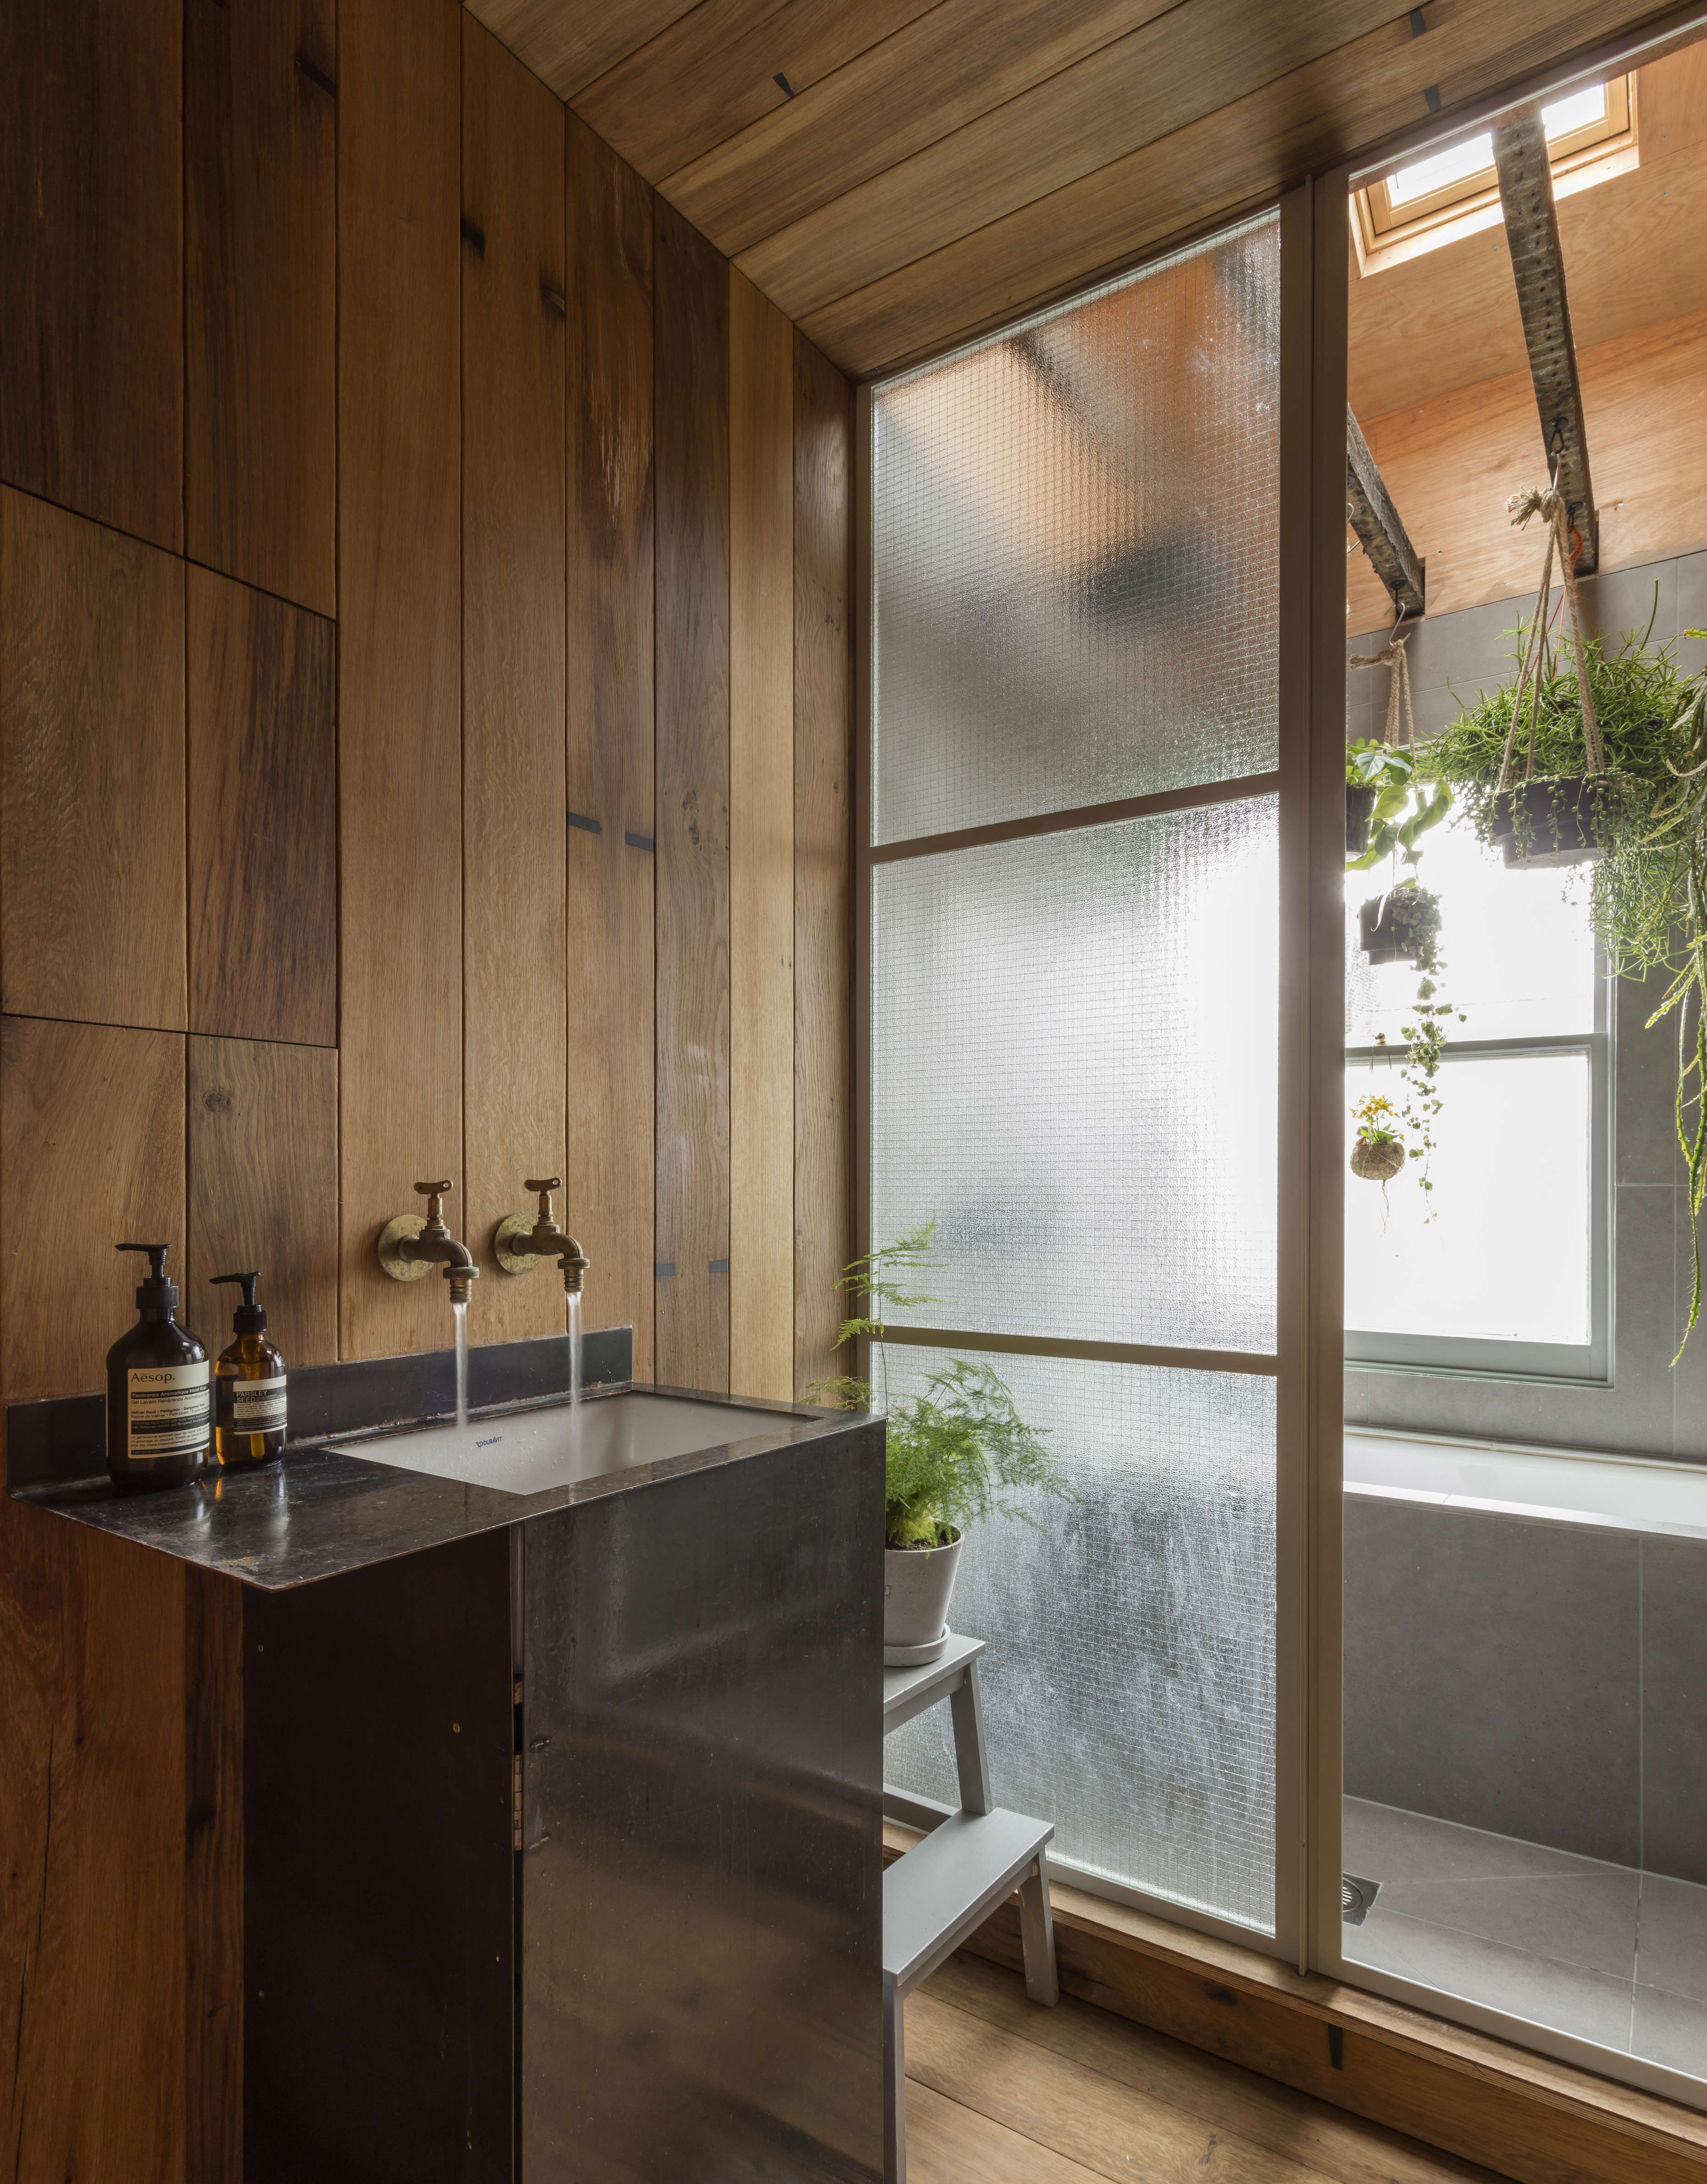 Wood Paneled Baths, 6 Favorites - Remodelista